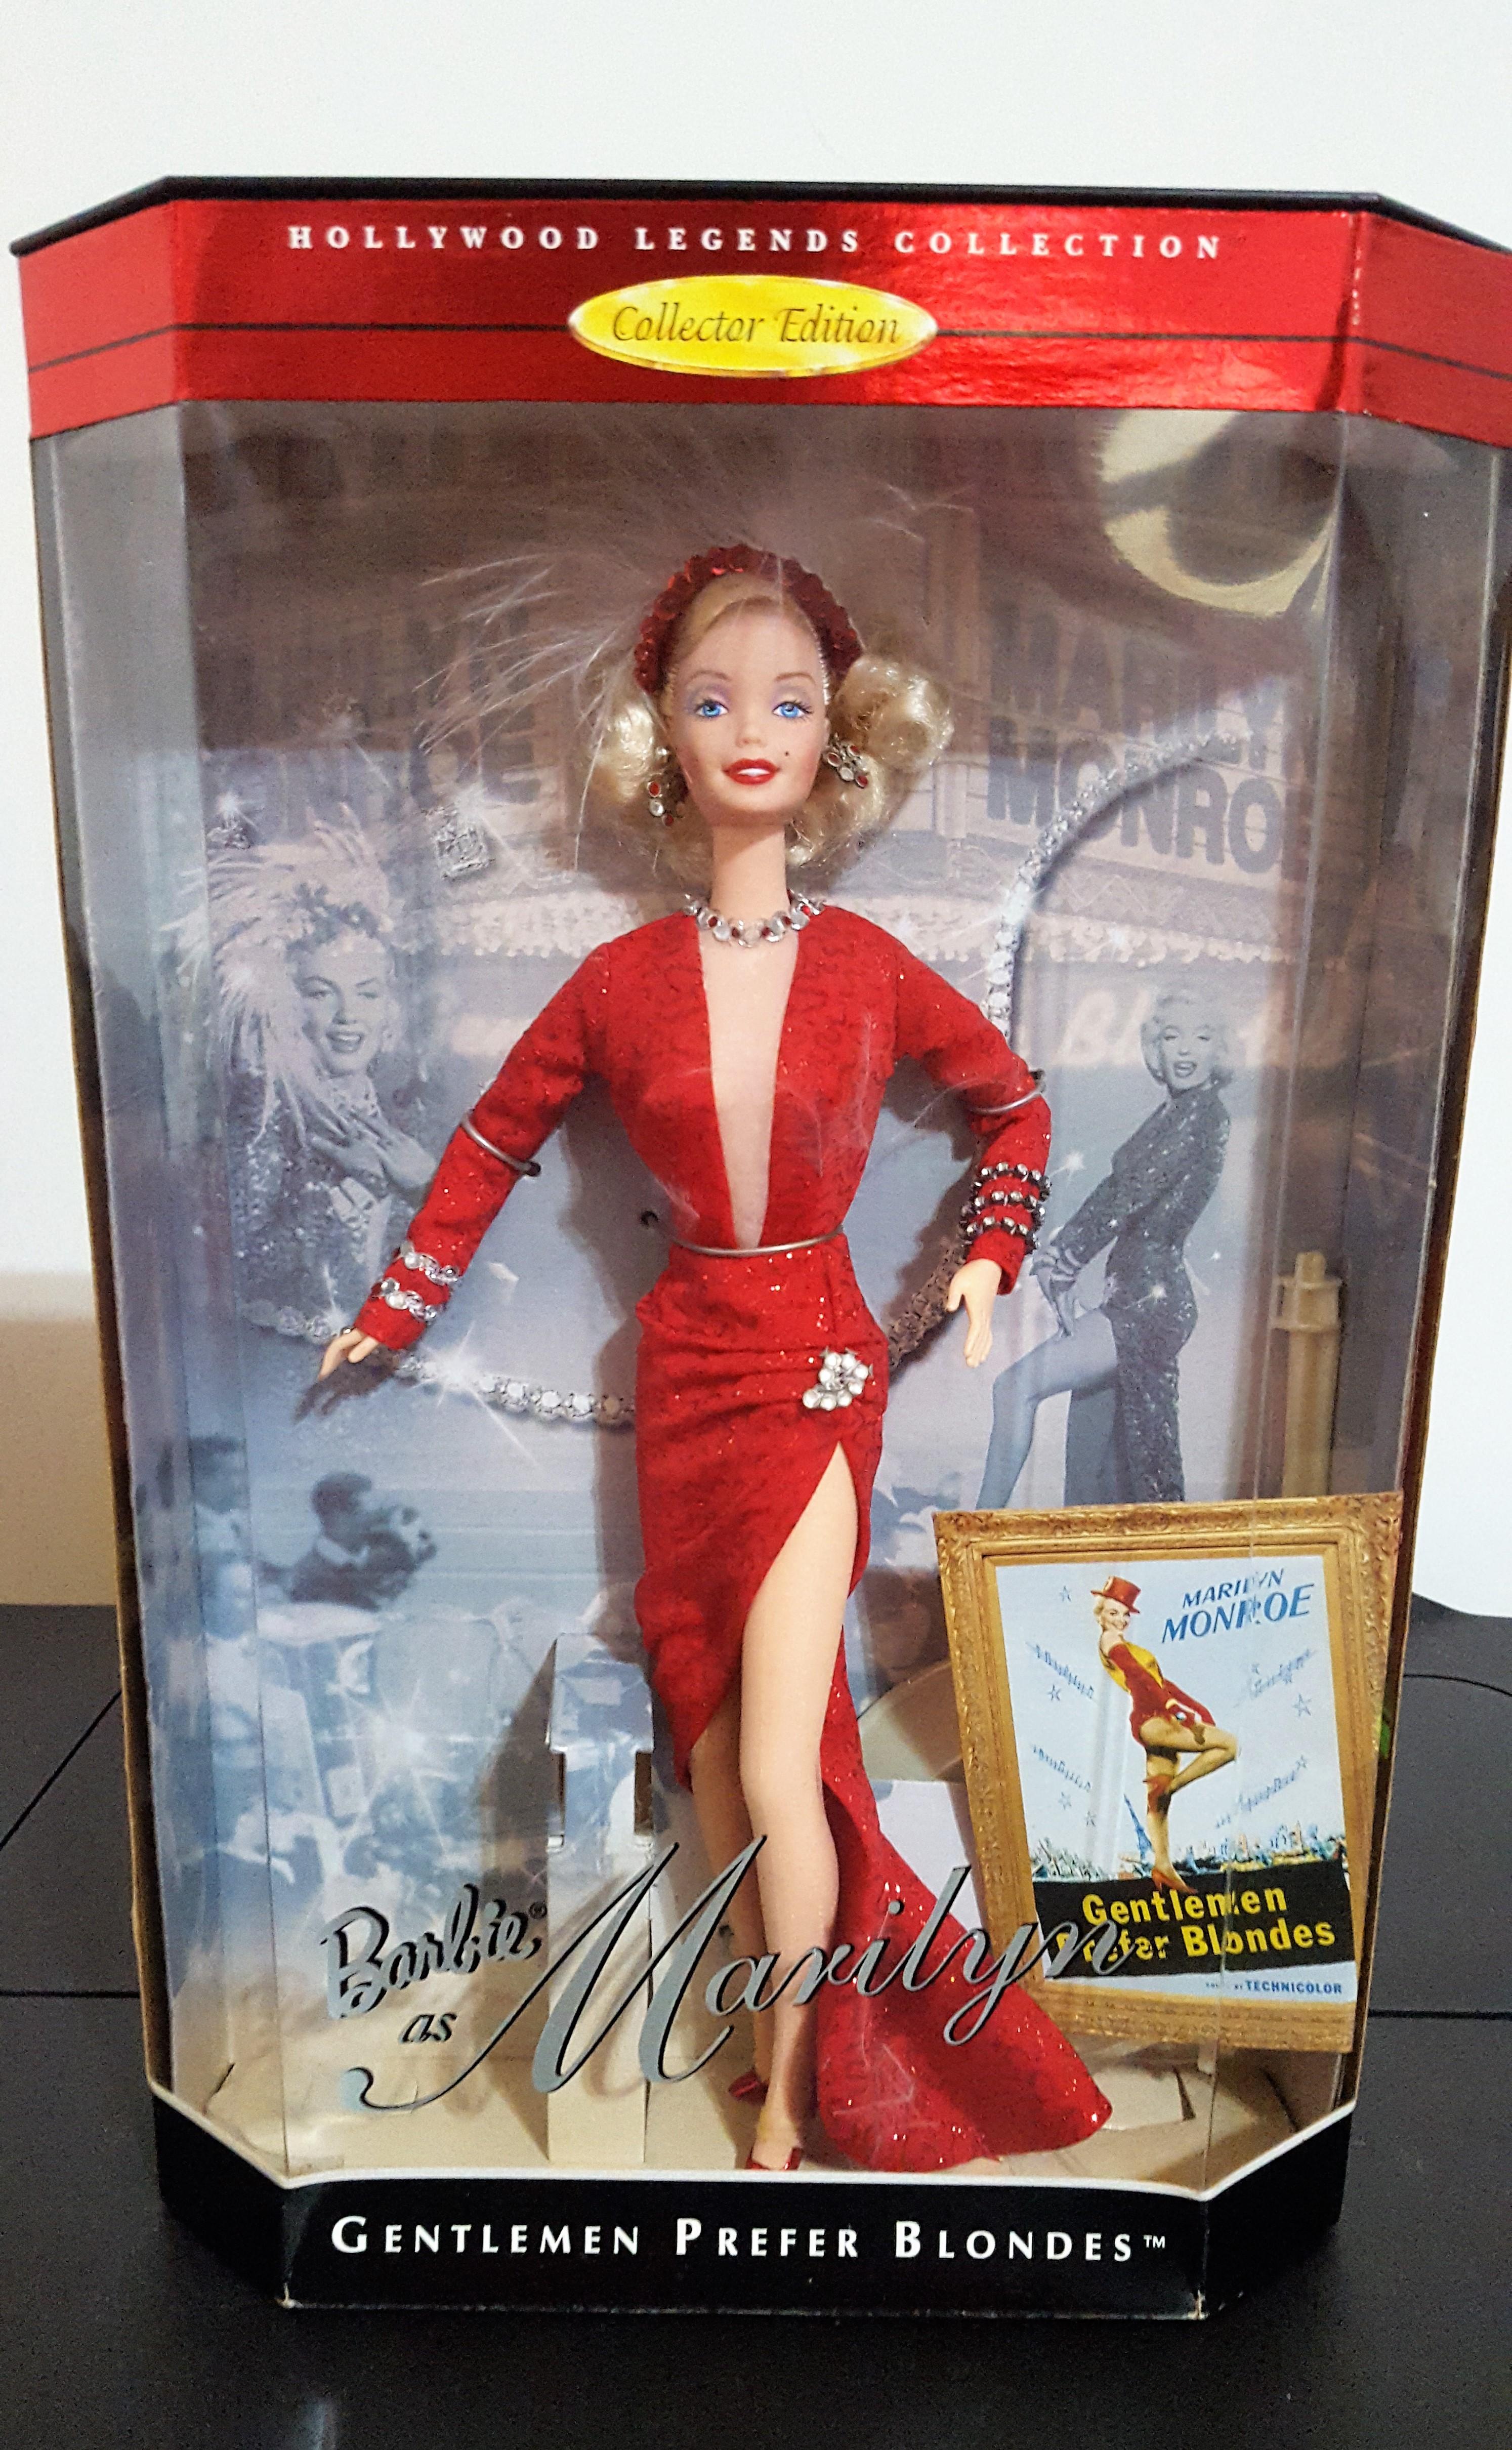 Marilyn Monroe Gentlemen Prefer Blodes shop mattel usa import nrfb